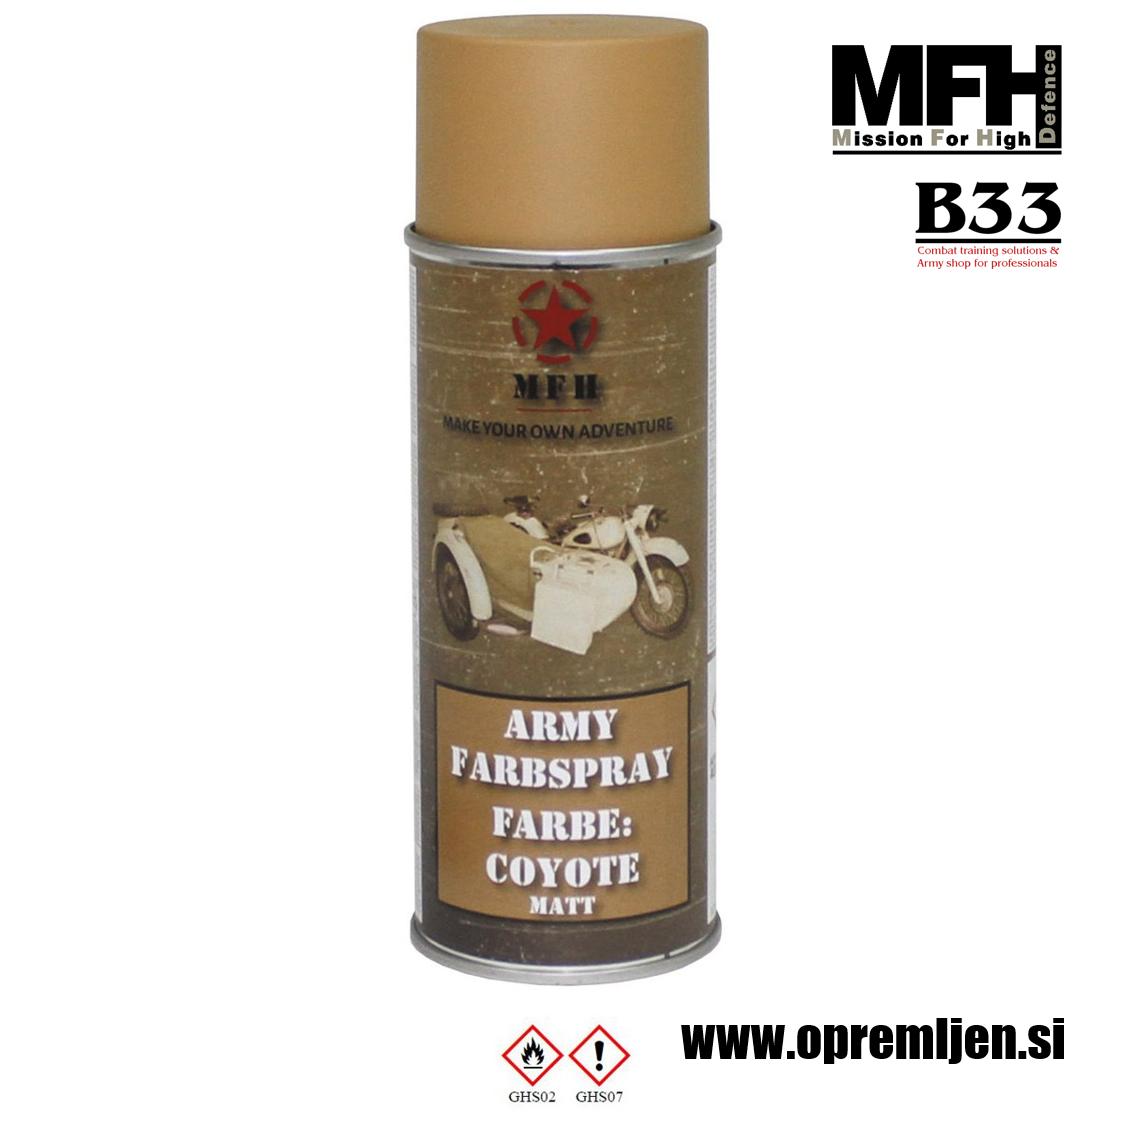 Vojaška barva sprej temno peščena COYOTE mat RAL1011 400ml MFH - Max Fuchs by B33 army shop at www.opremljen.si